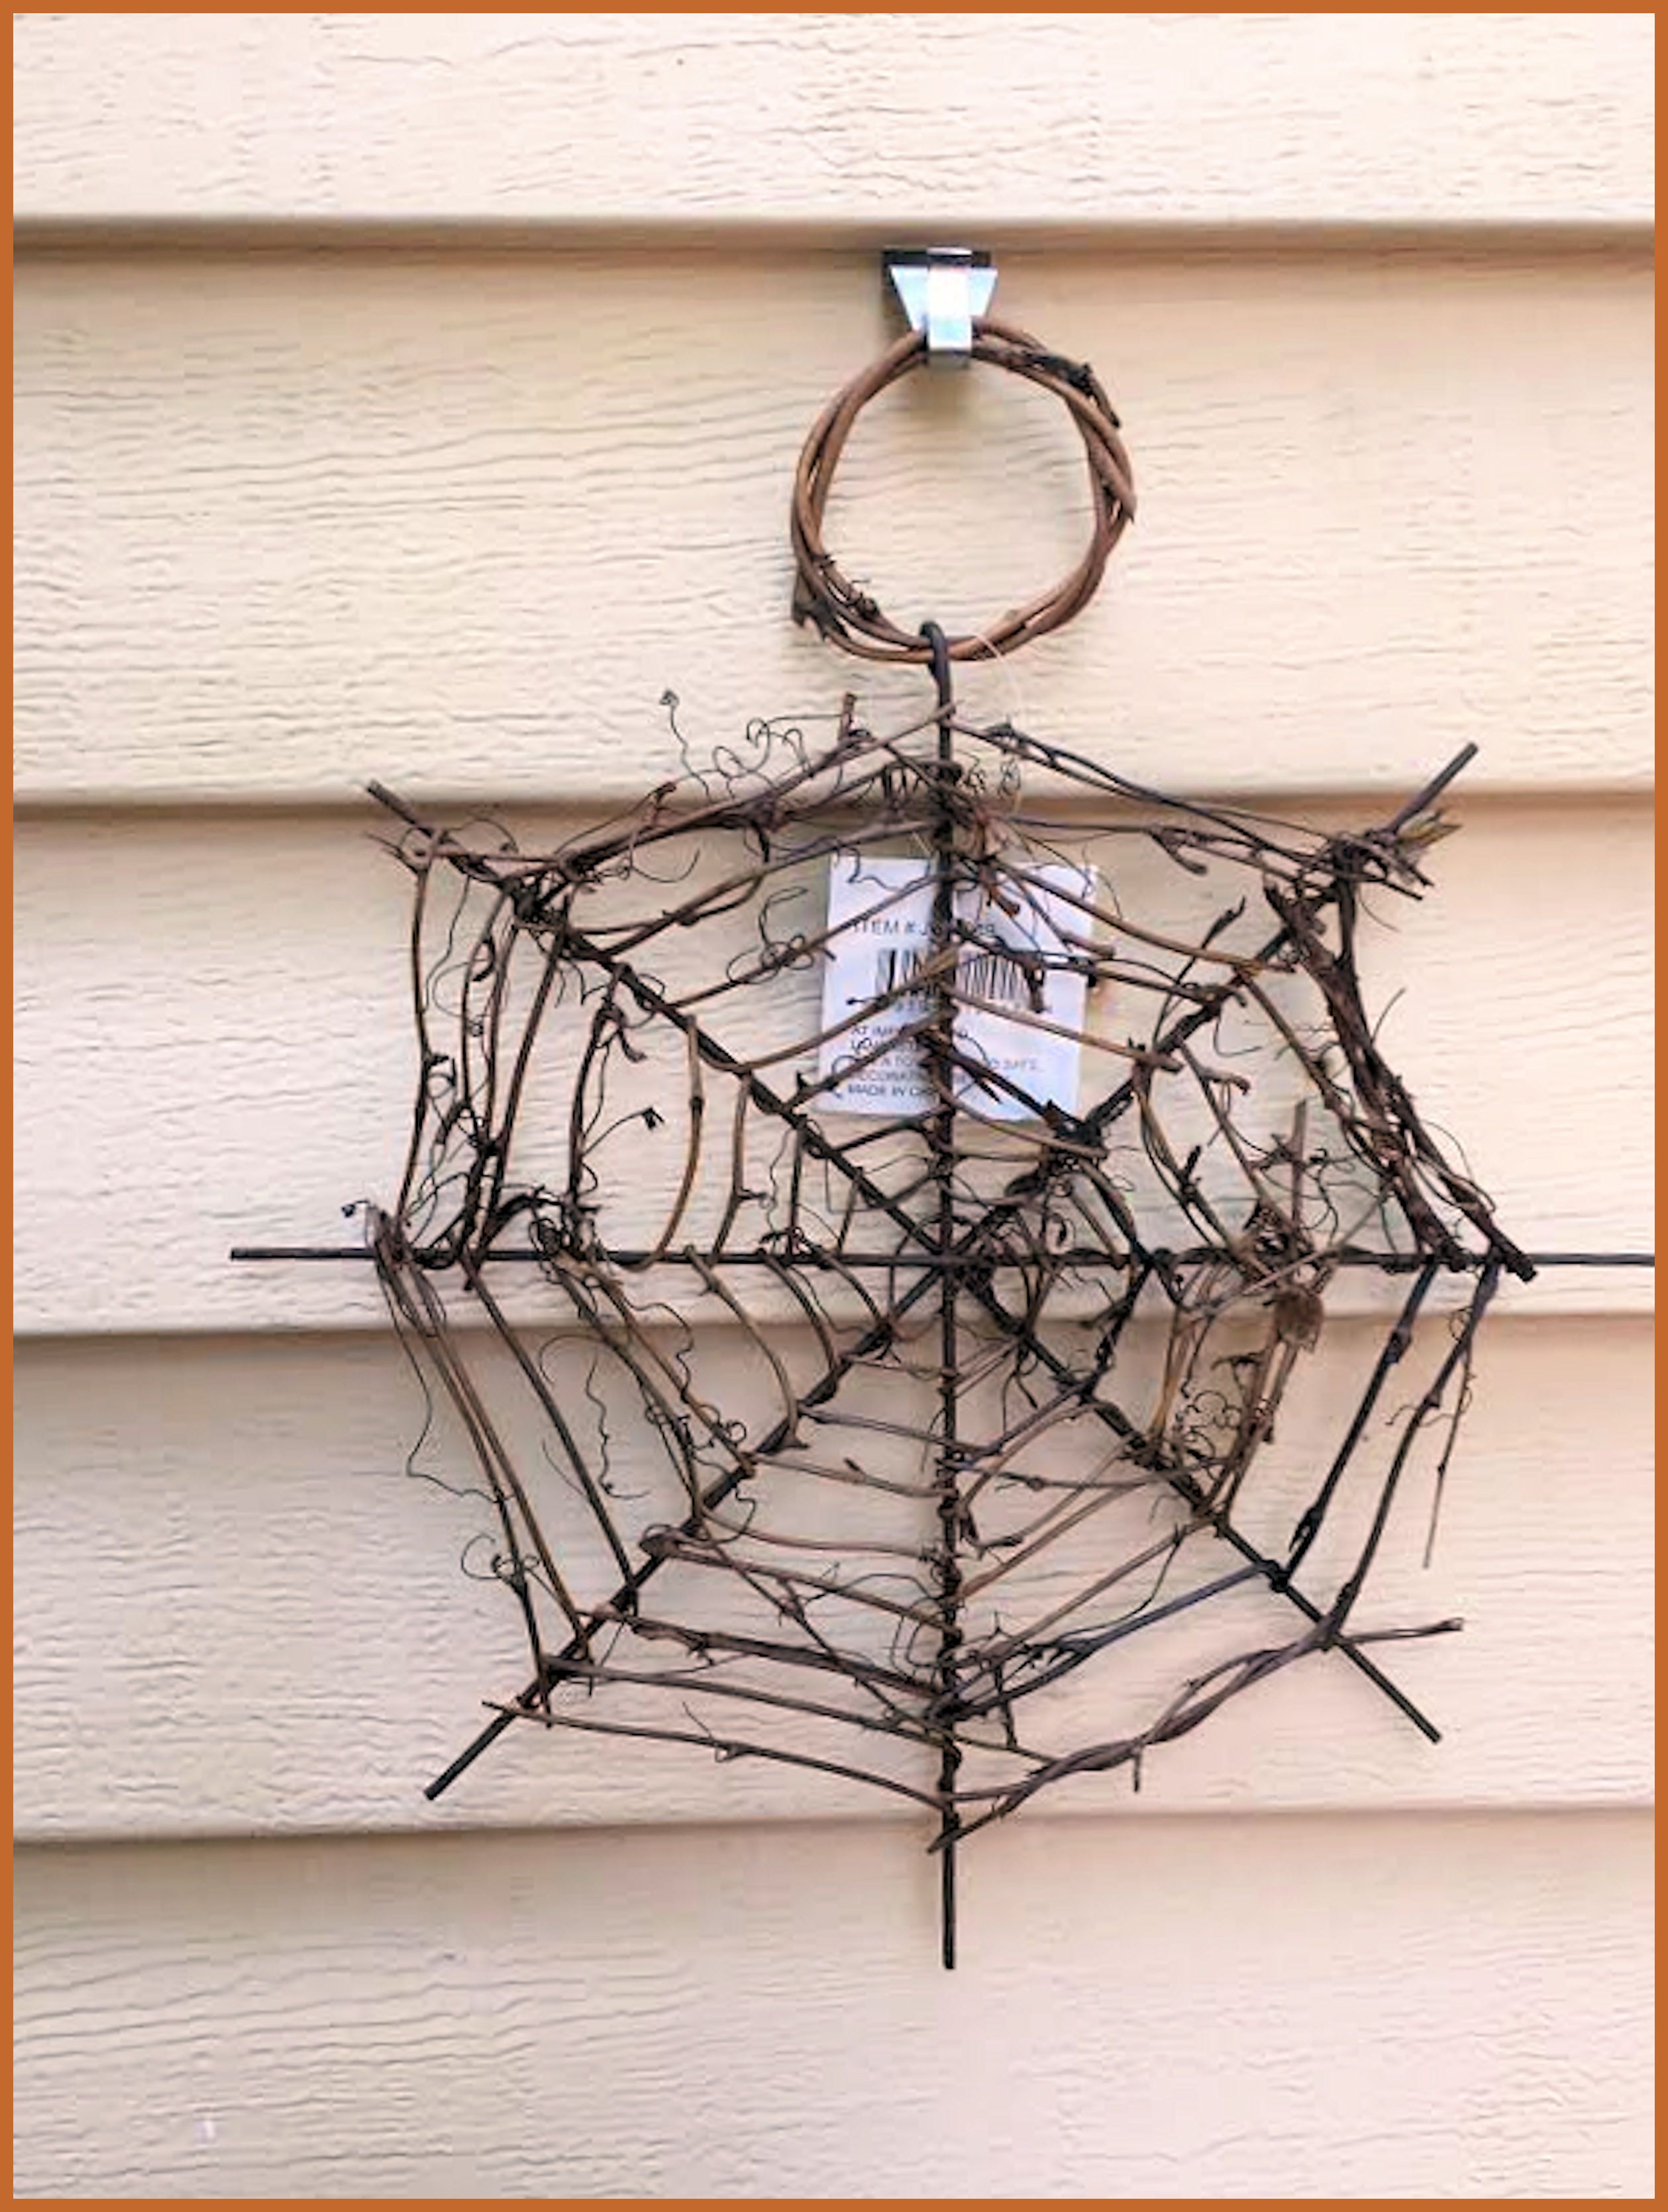 da-spider-web-small-10-inch-da-jhf6919.jpg